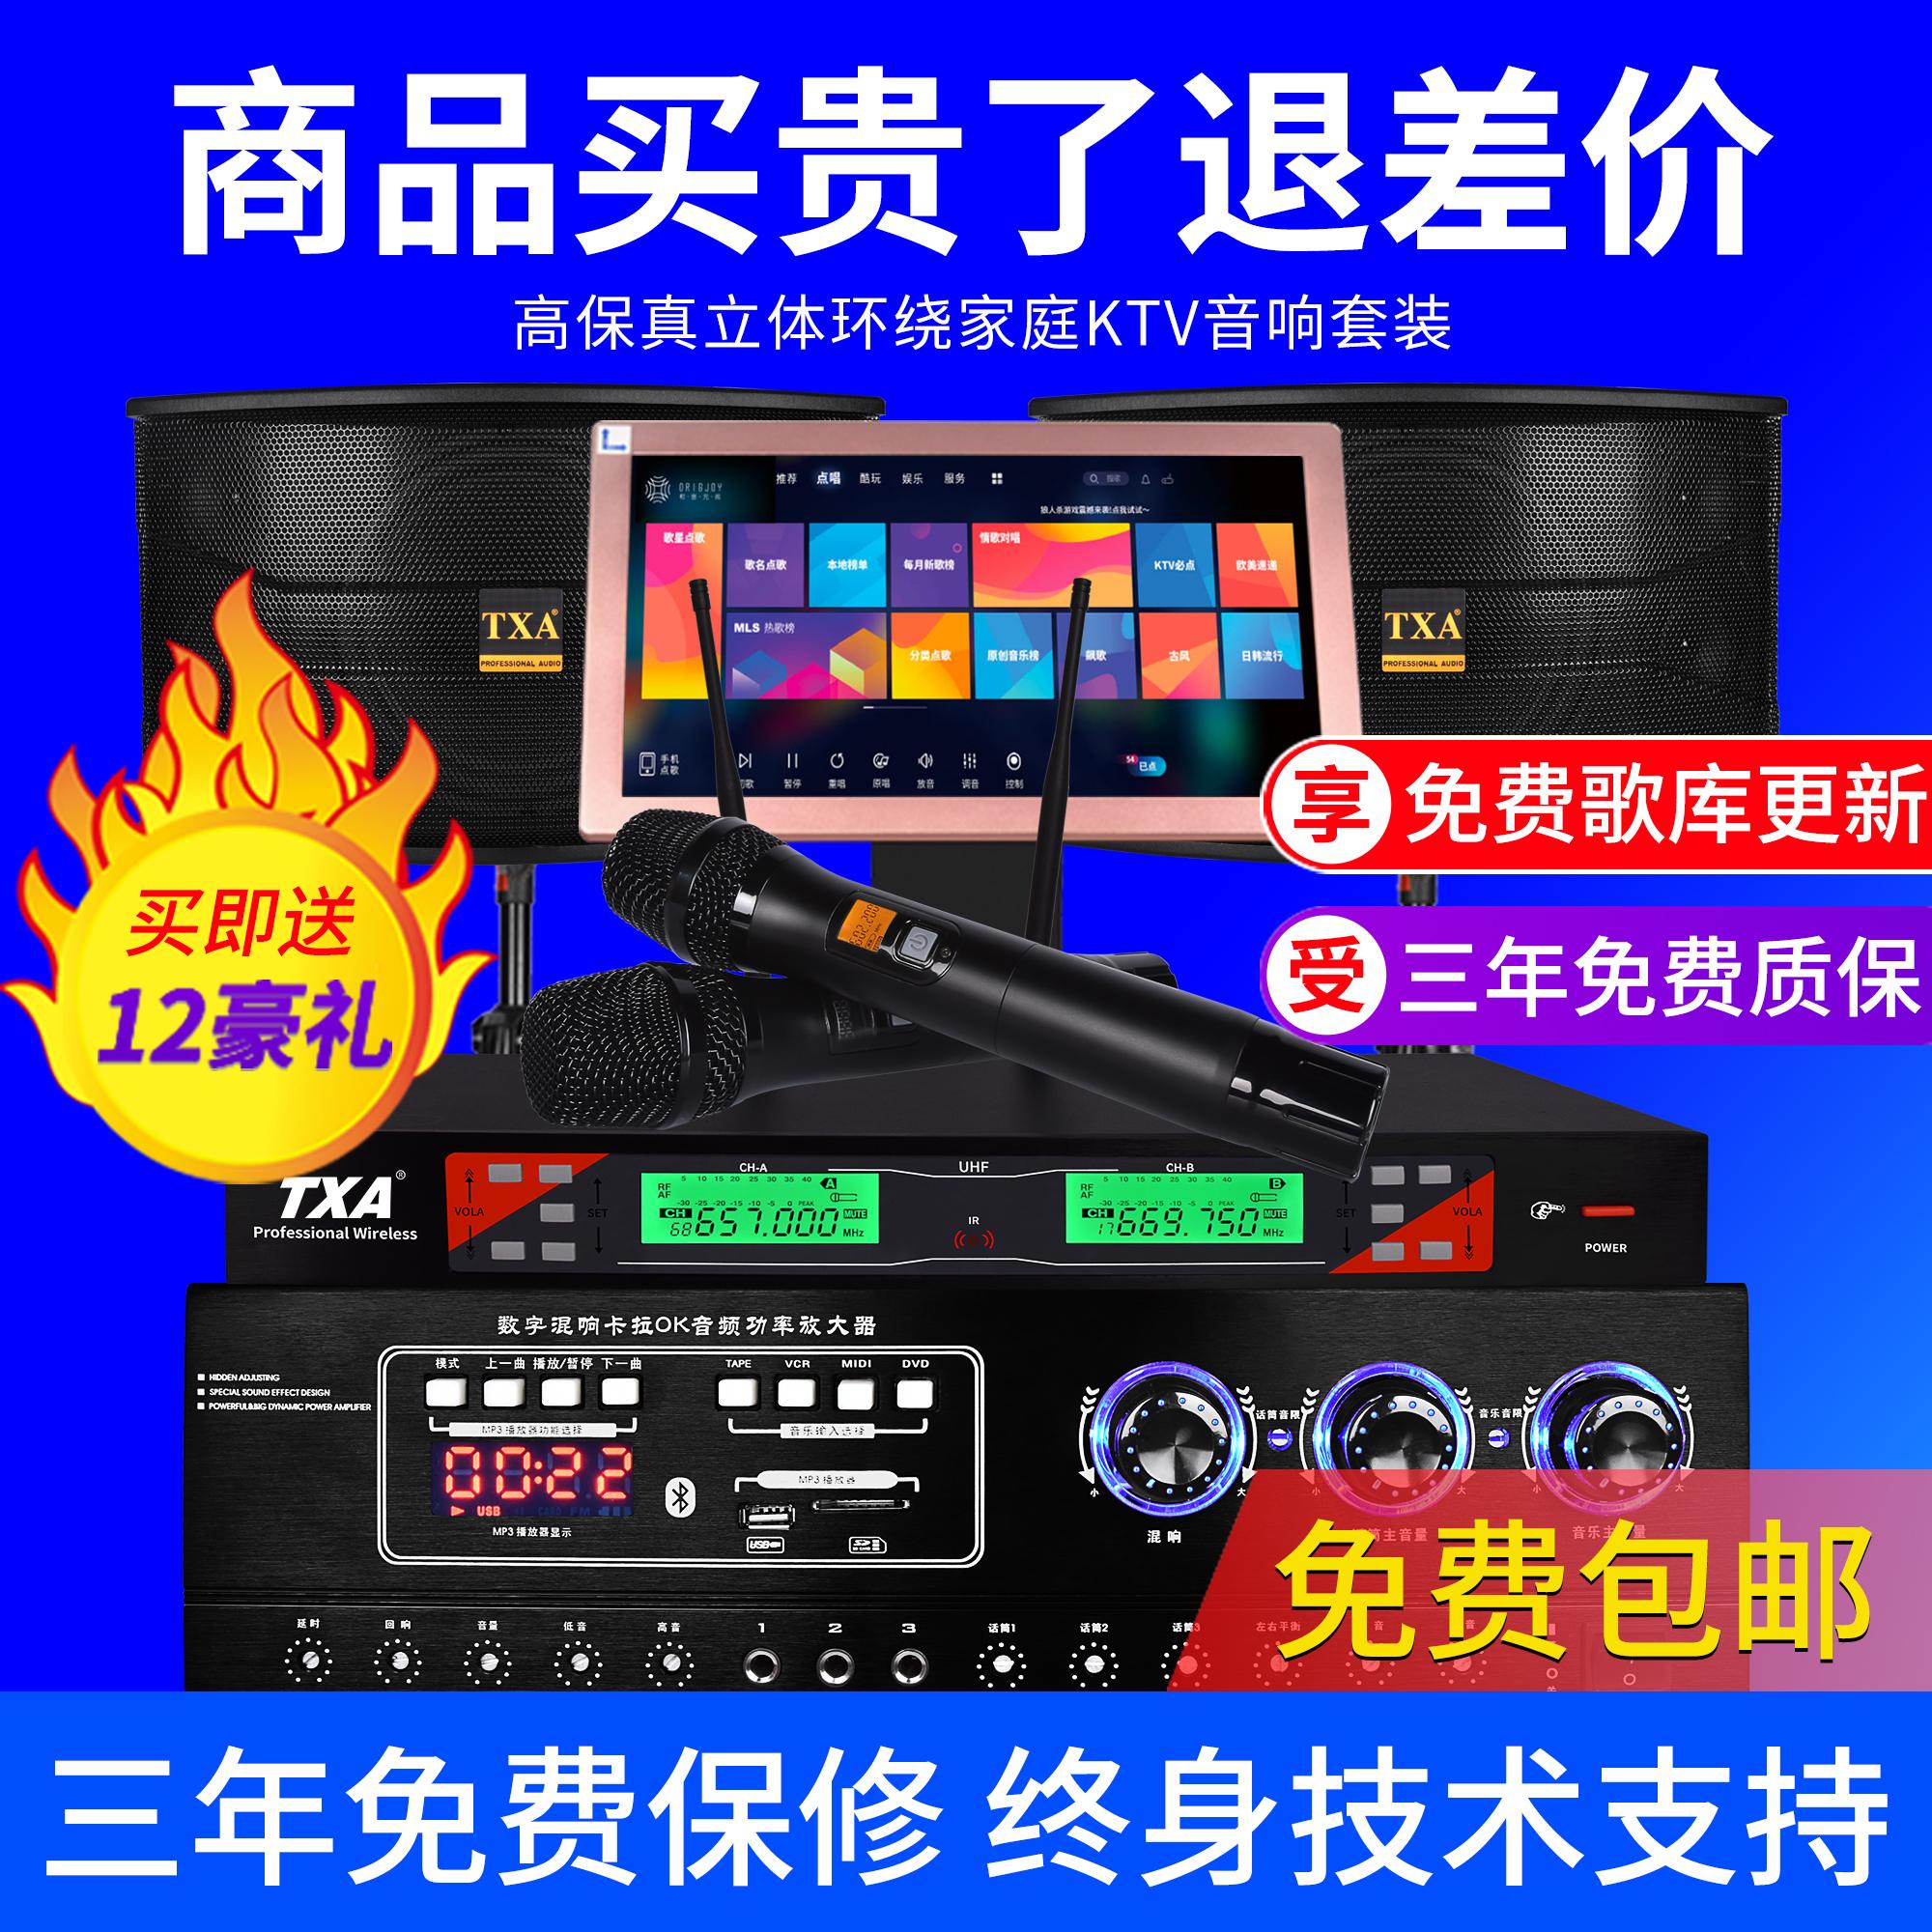 TXA K88 family KTV sound set household karaoke all-in-one machine song ordering machine power amplifier complete set